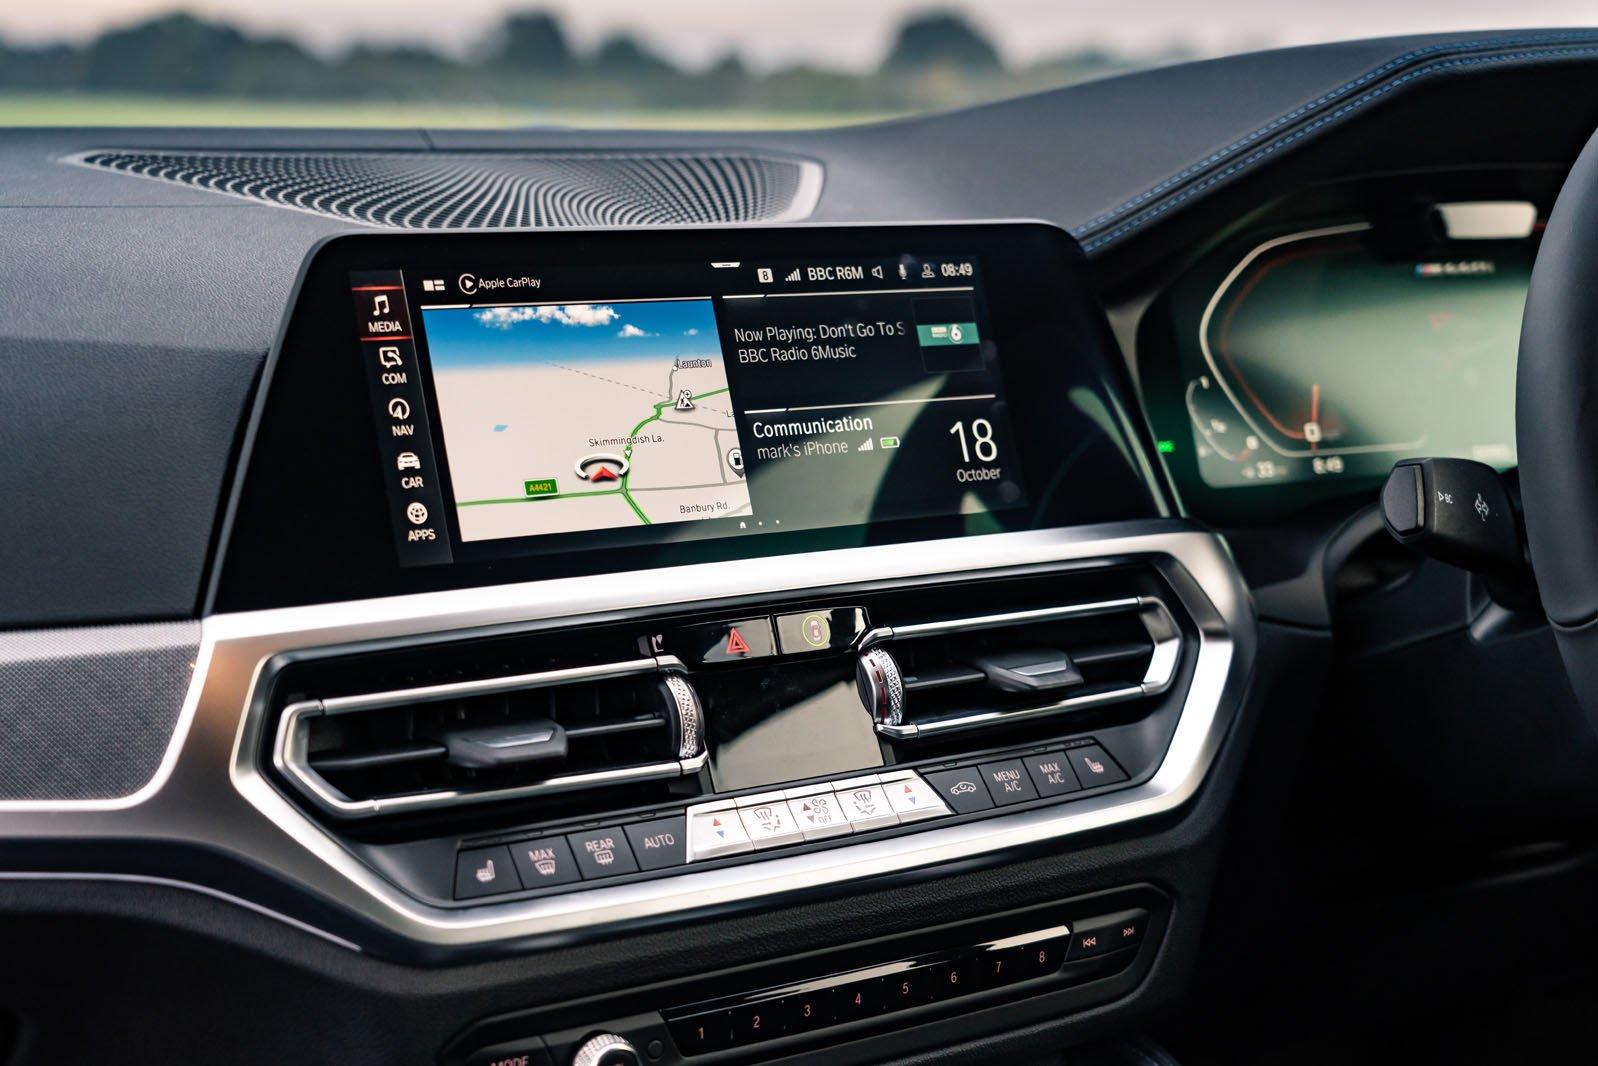 BMW 4 Series Coupé 2020 infotainment